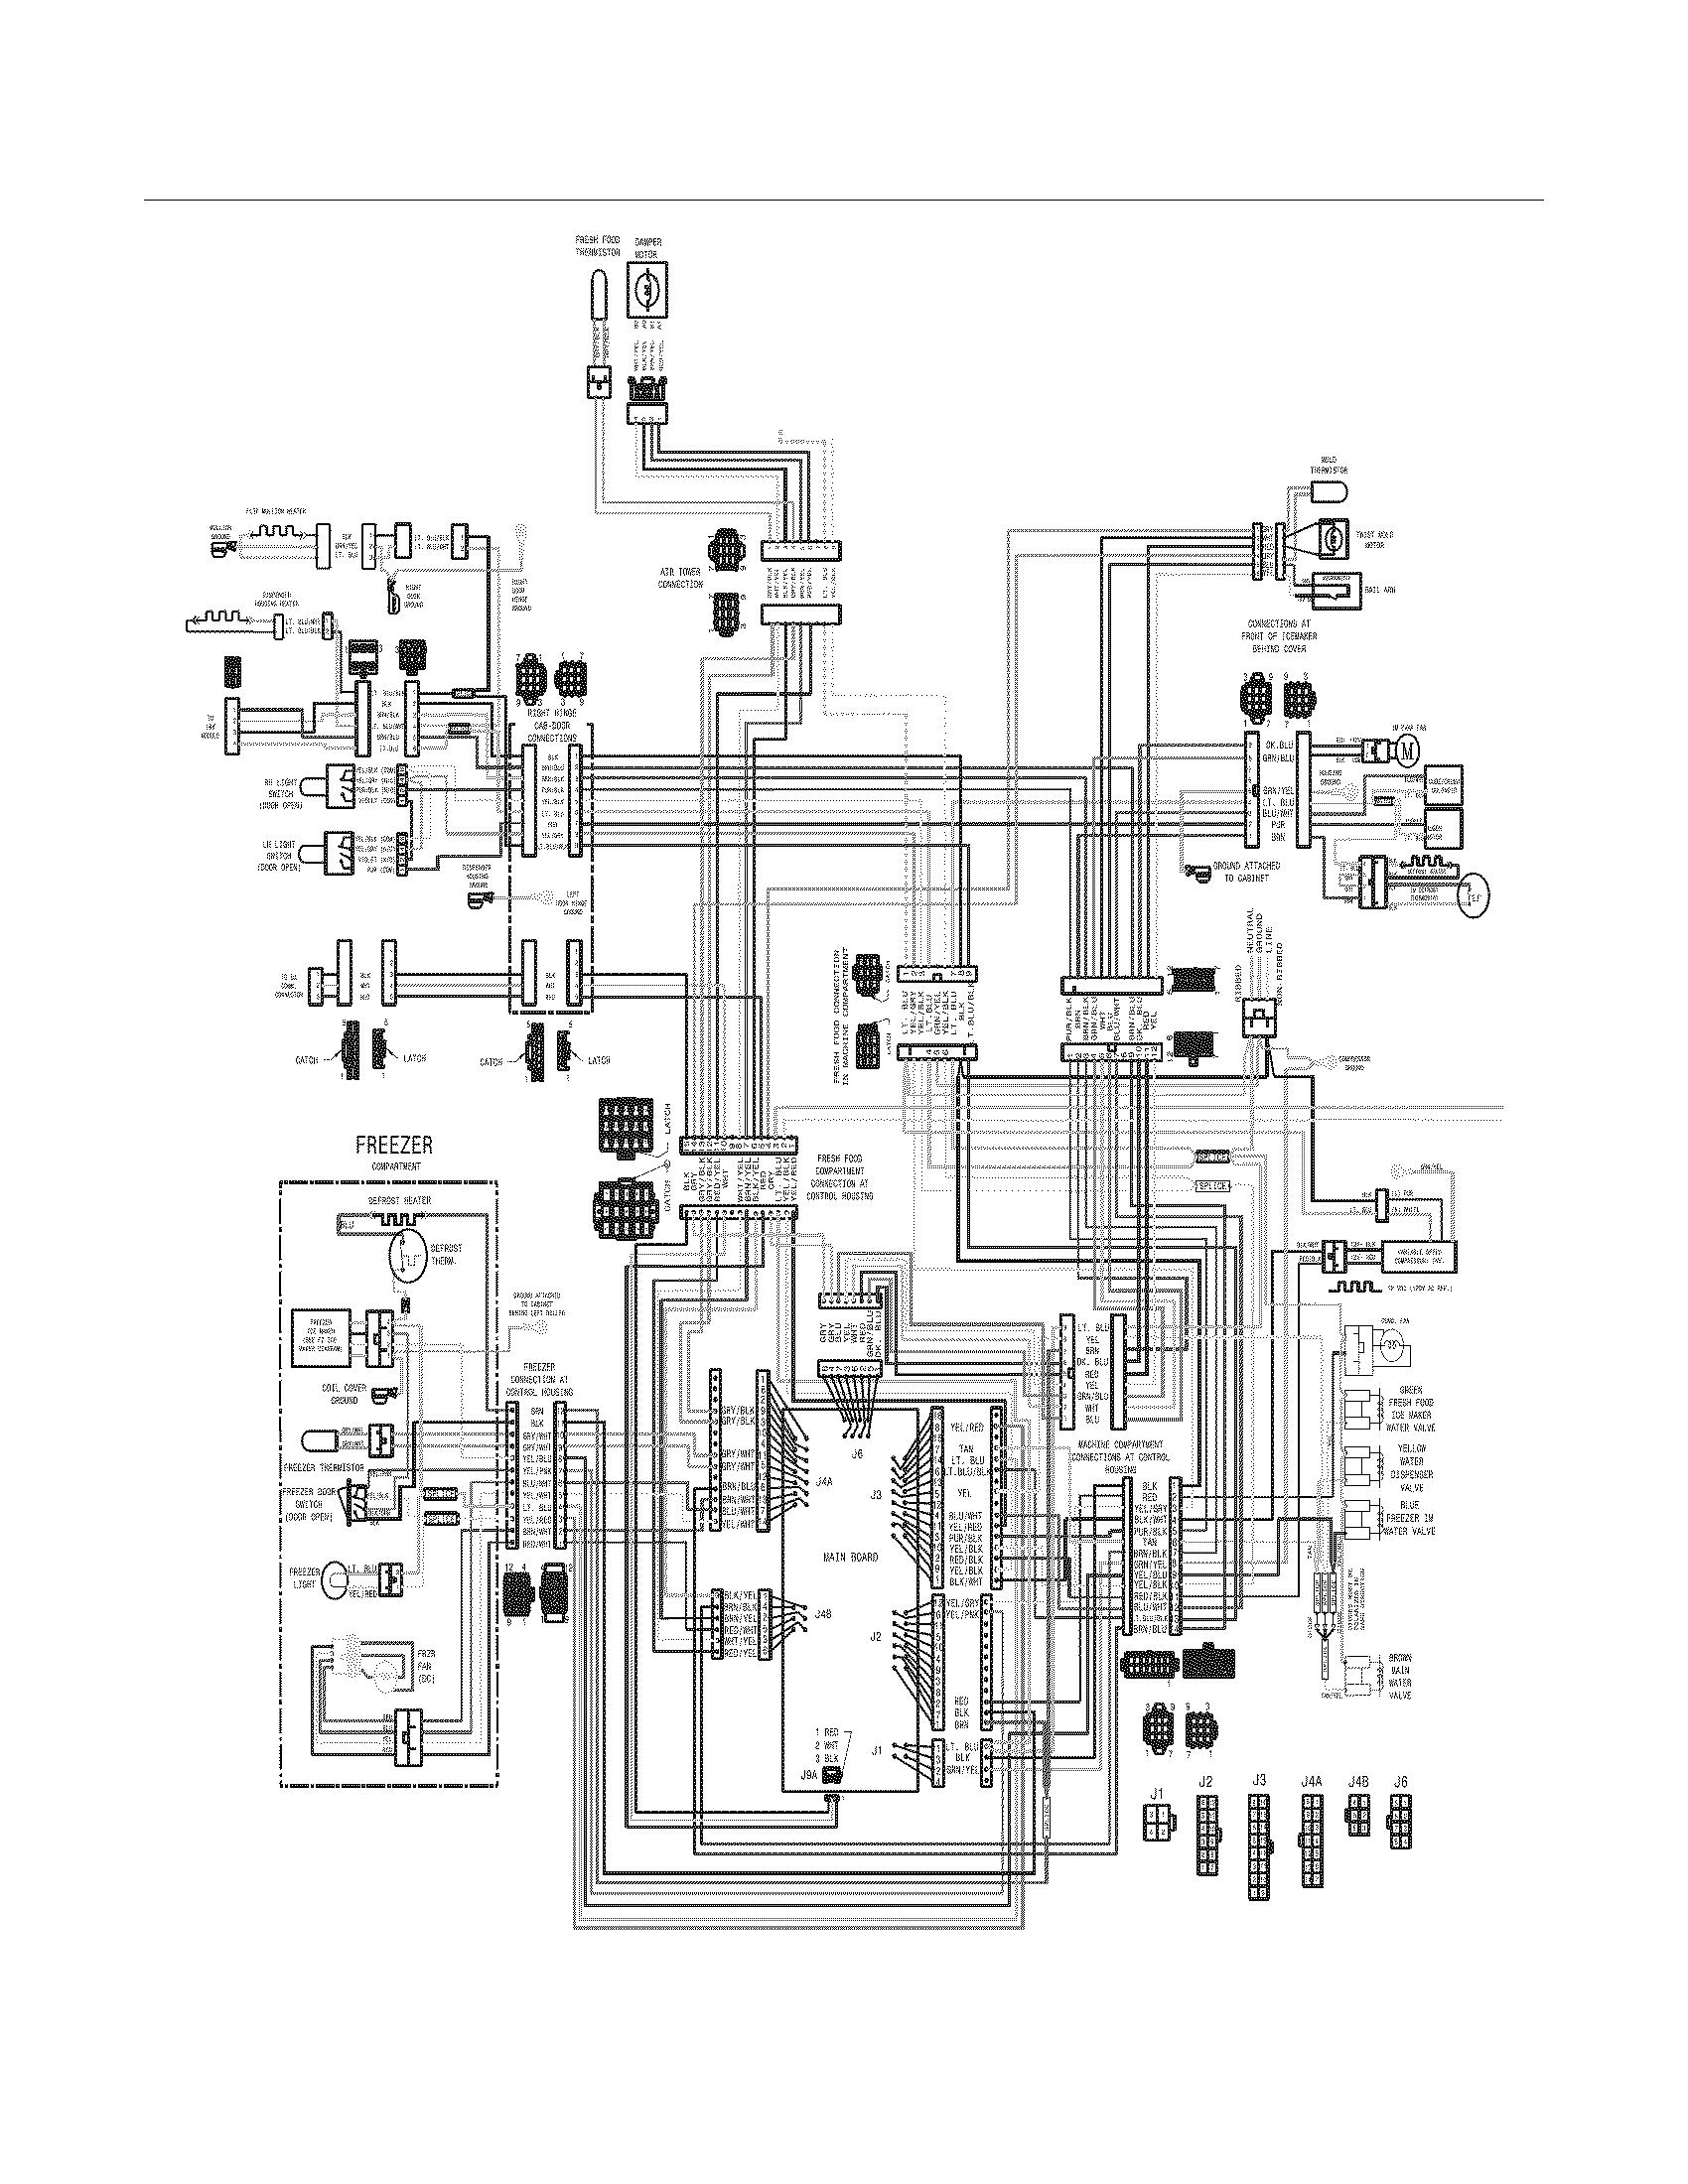 Crosley  Refrigerator  Wiring diagram